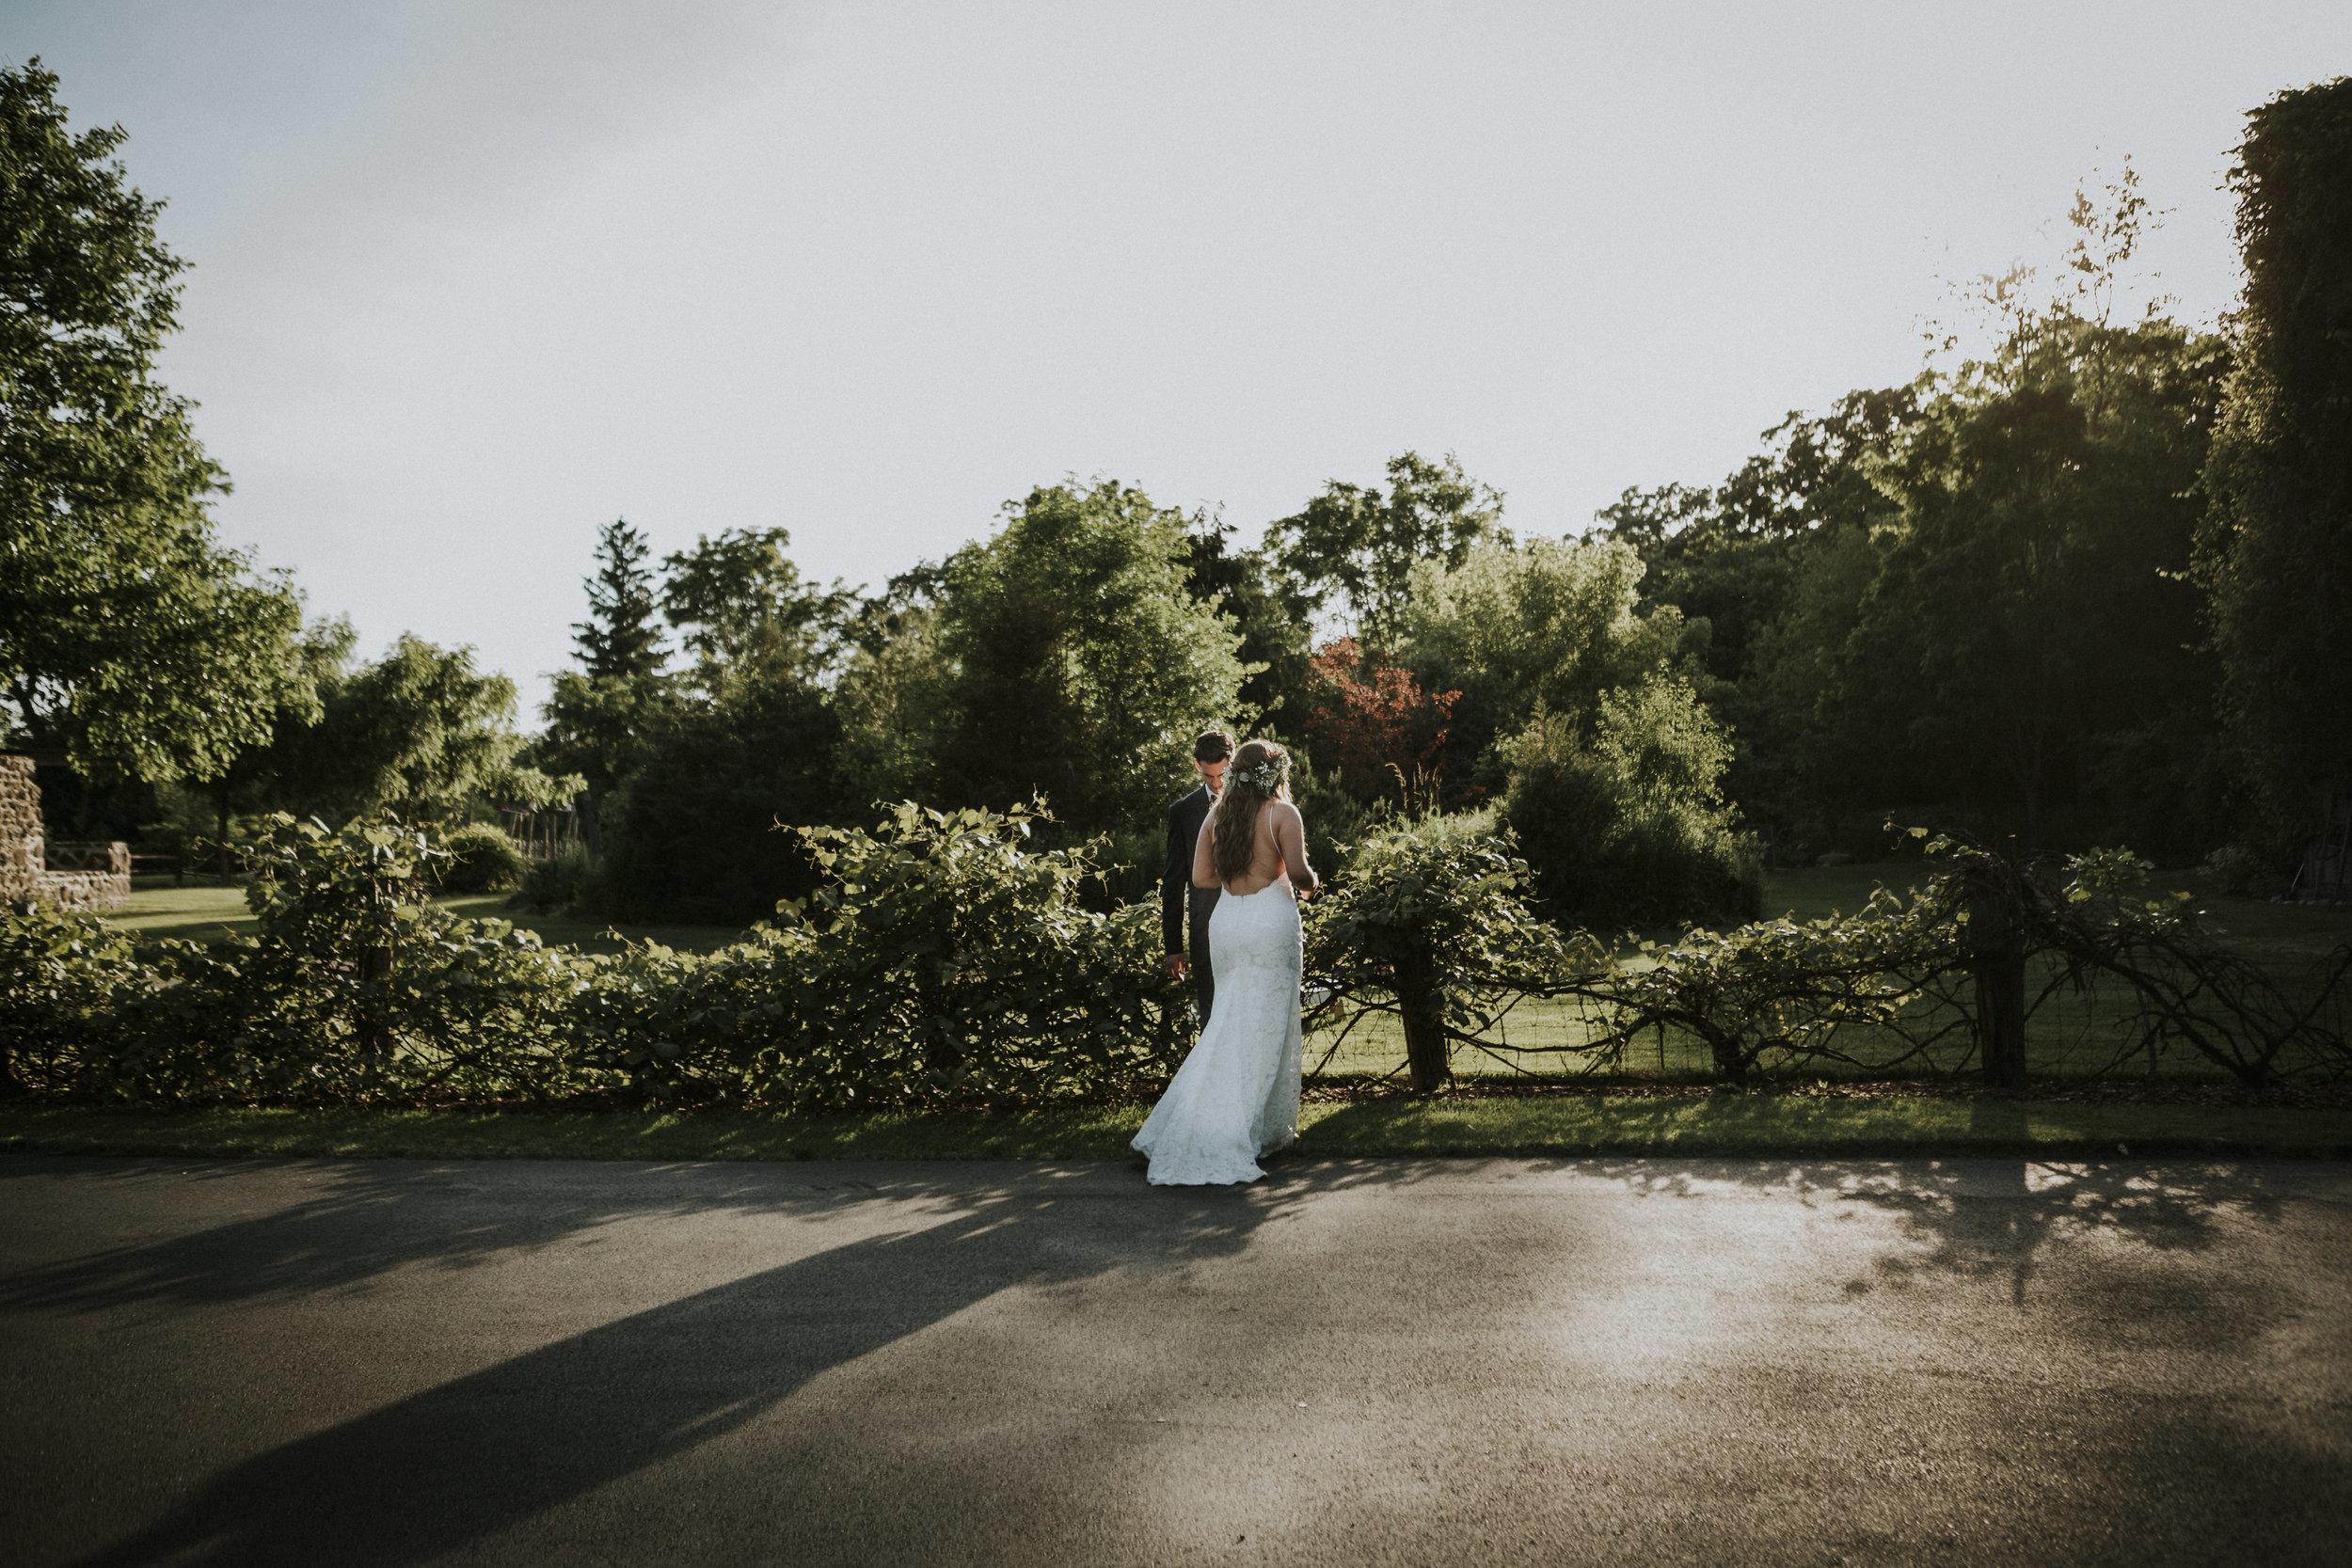 Courtney+Lawrence_Wedding_27.jpg